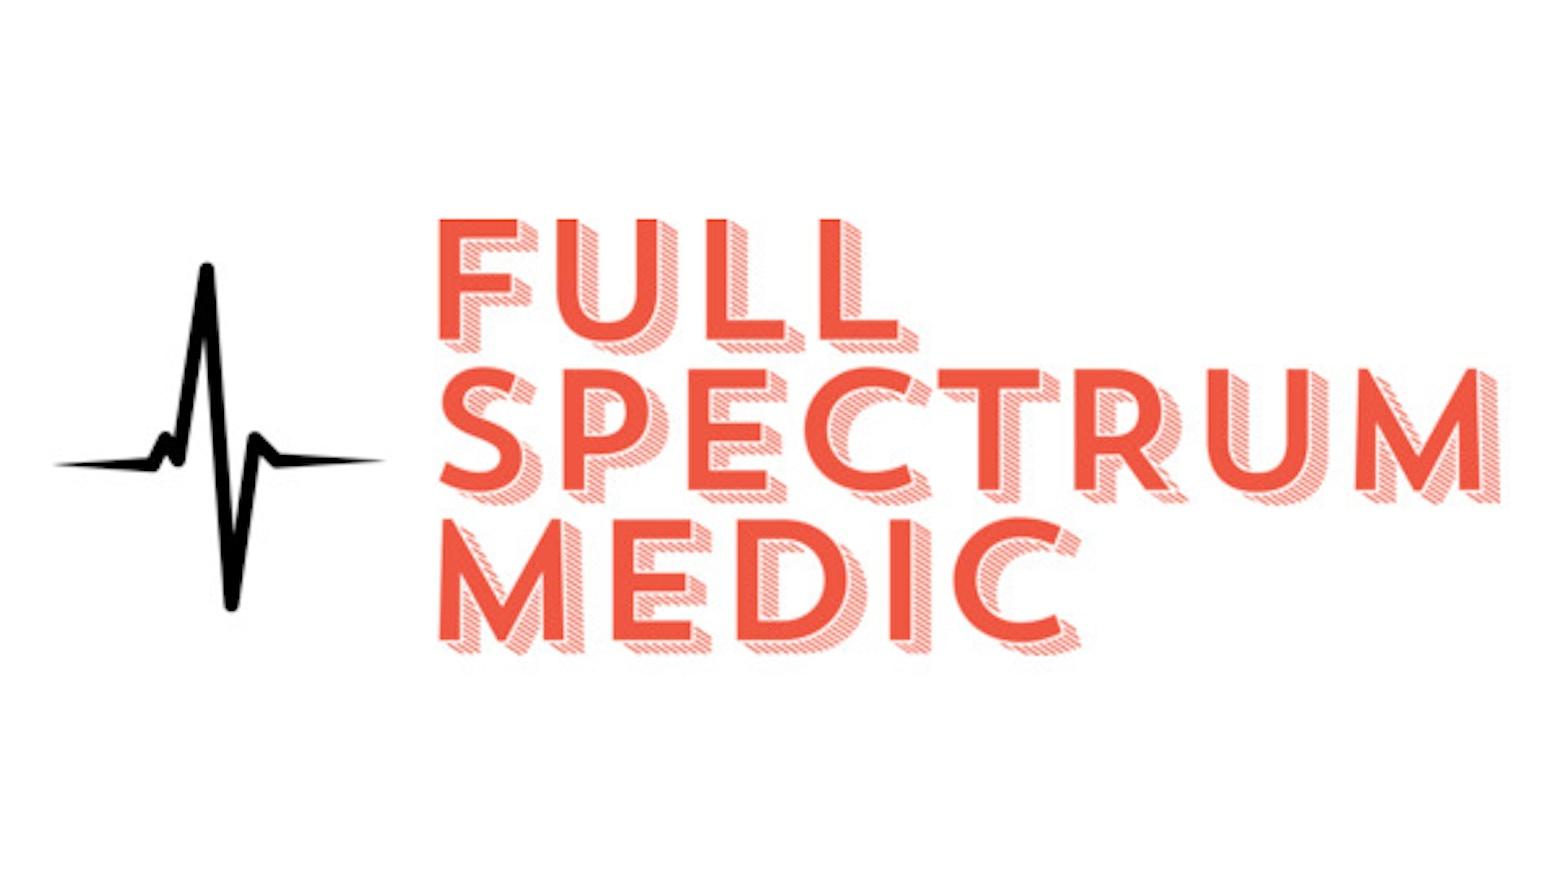 Full Spectrum Medic Website by Raul